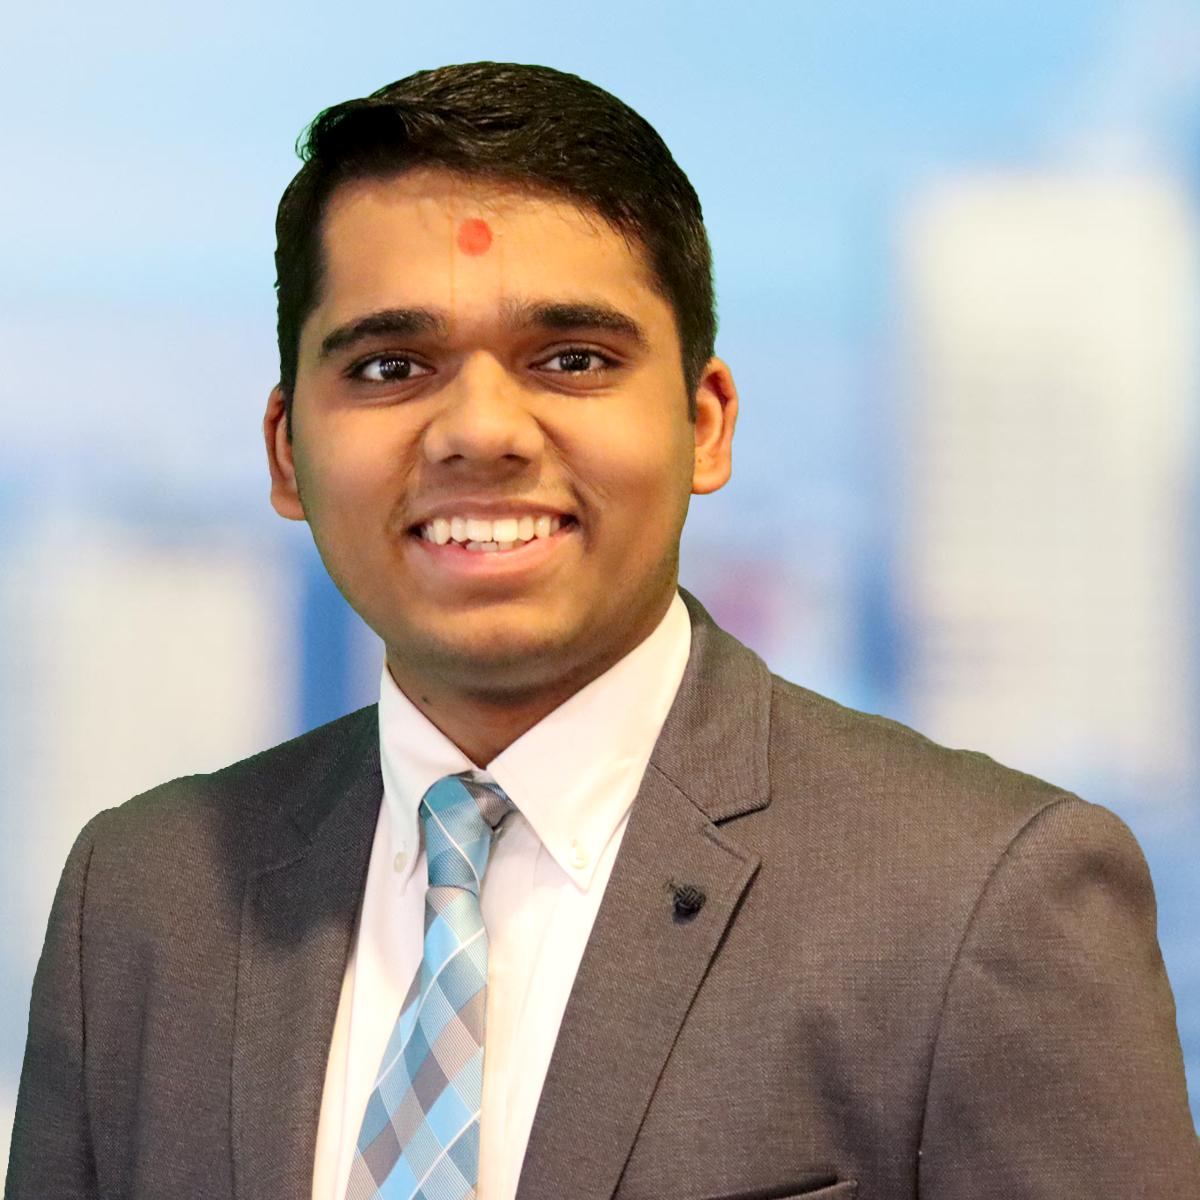 SSP 2020 Student, Avinash Thakkar